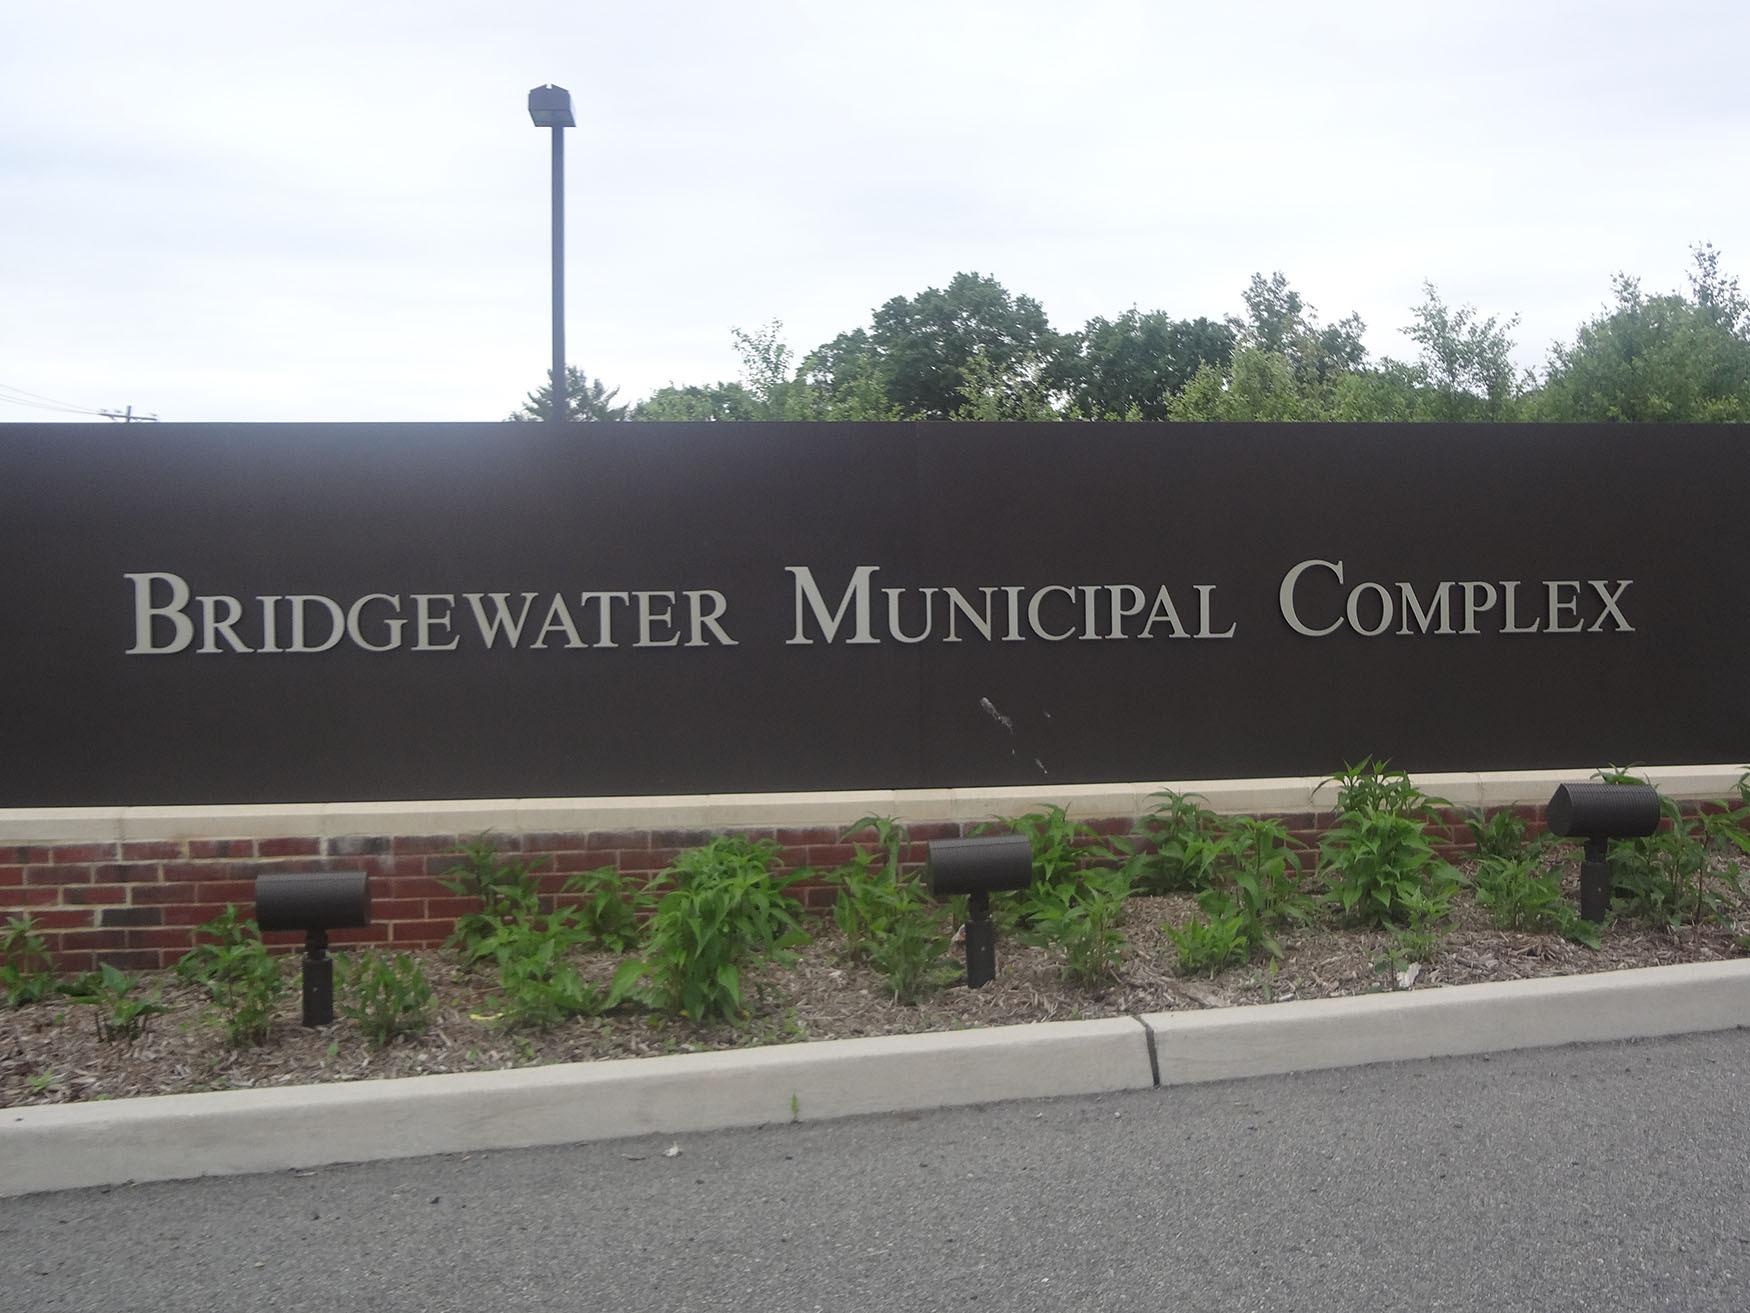 1c1f98282921cab32a94_Bridgewater_municipal.jpg